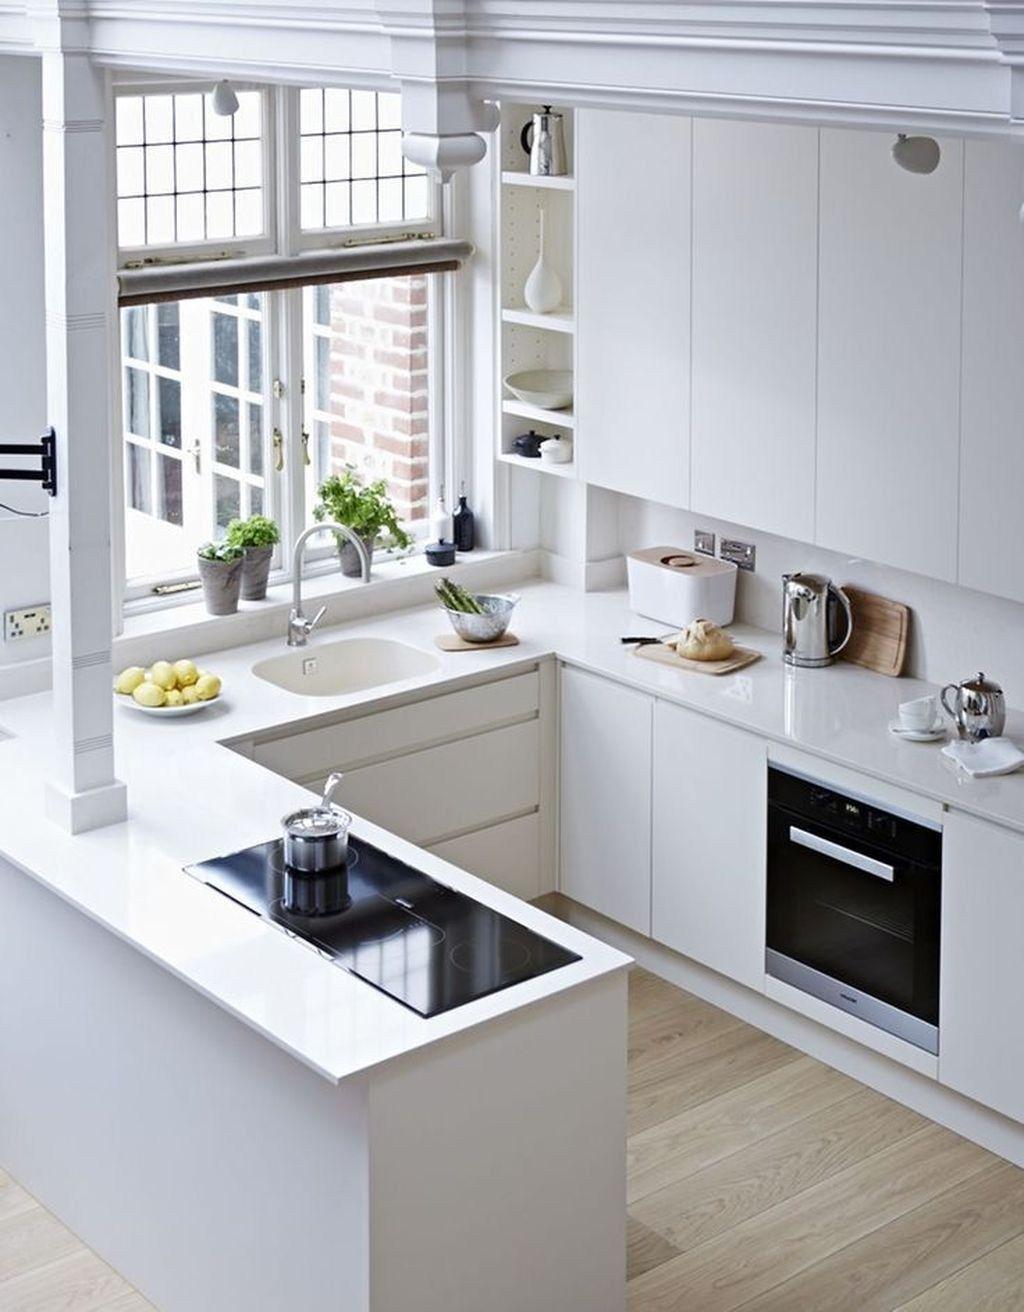 30+ Inspiring Small Modern Kitchen Design Ideas #topkitchendesigns